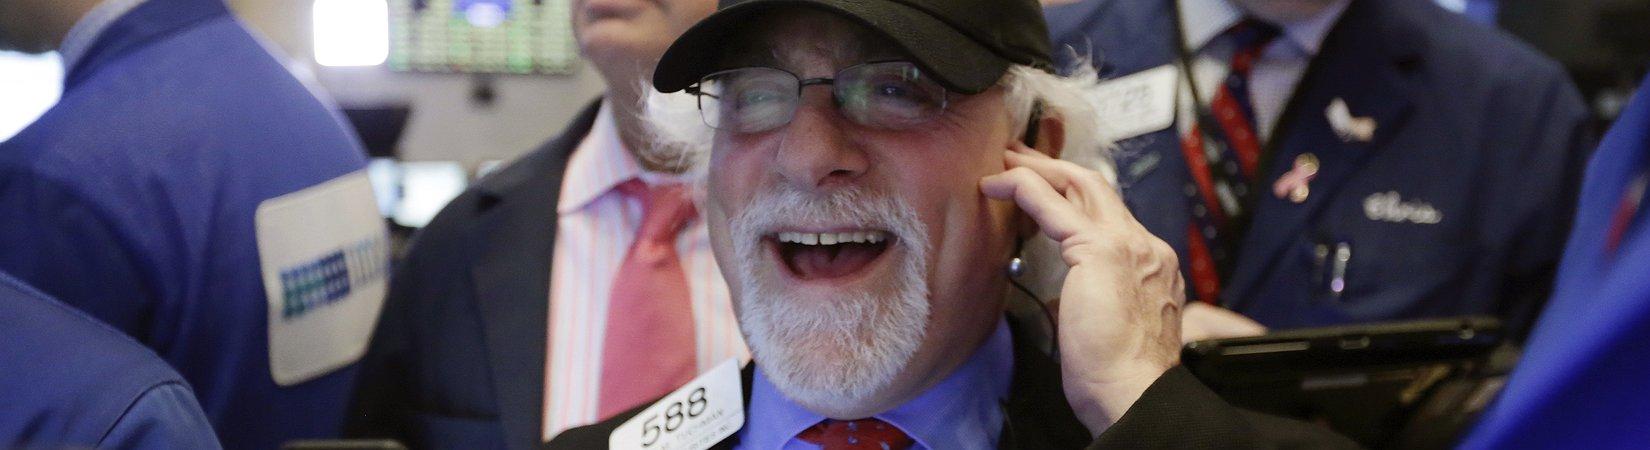 Индекс Dow Jones обновил рекордный максимум